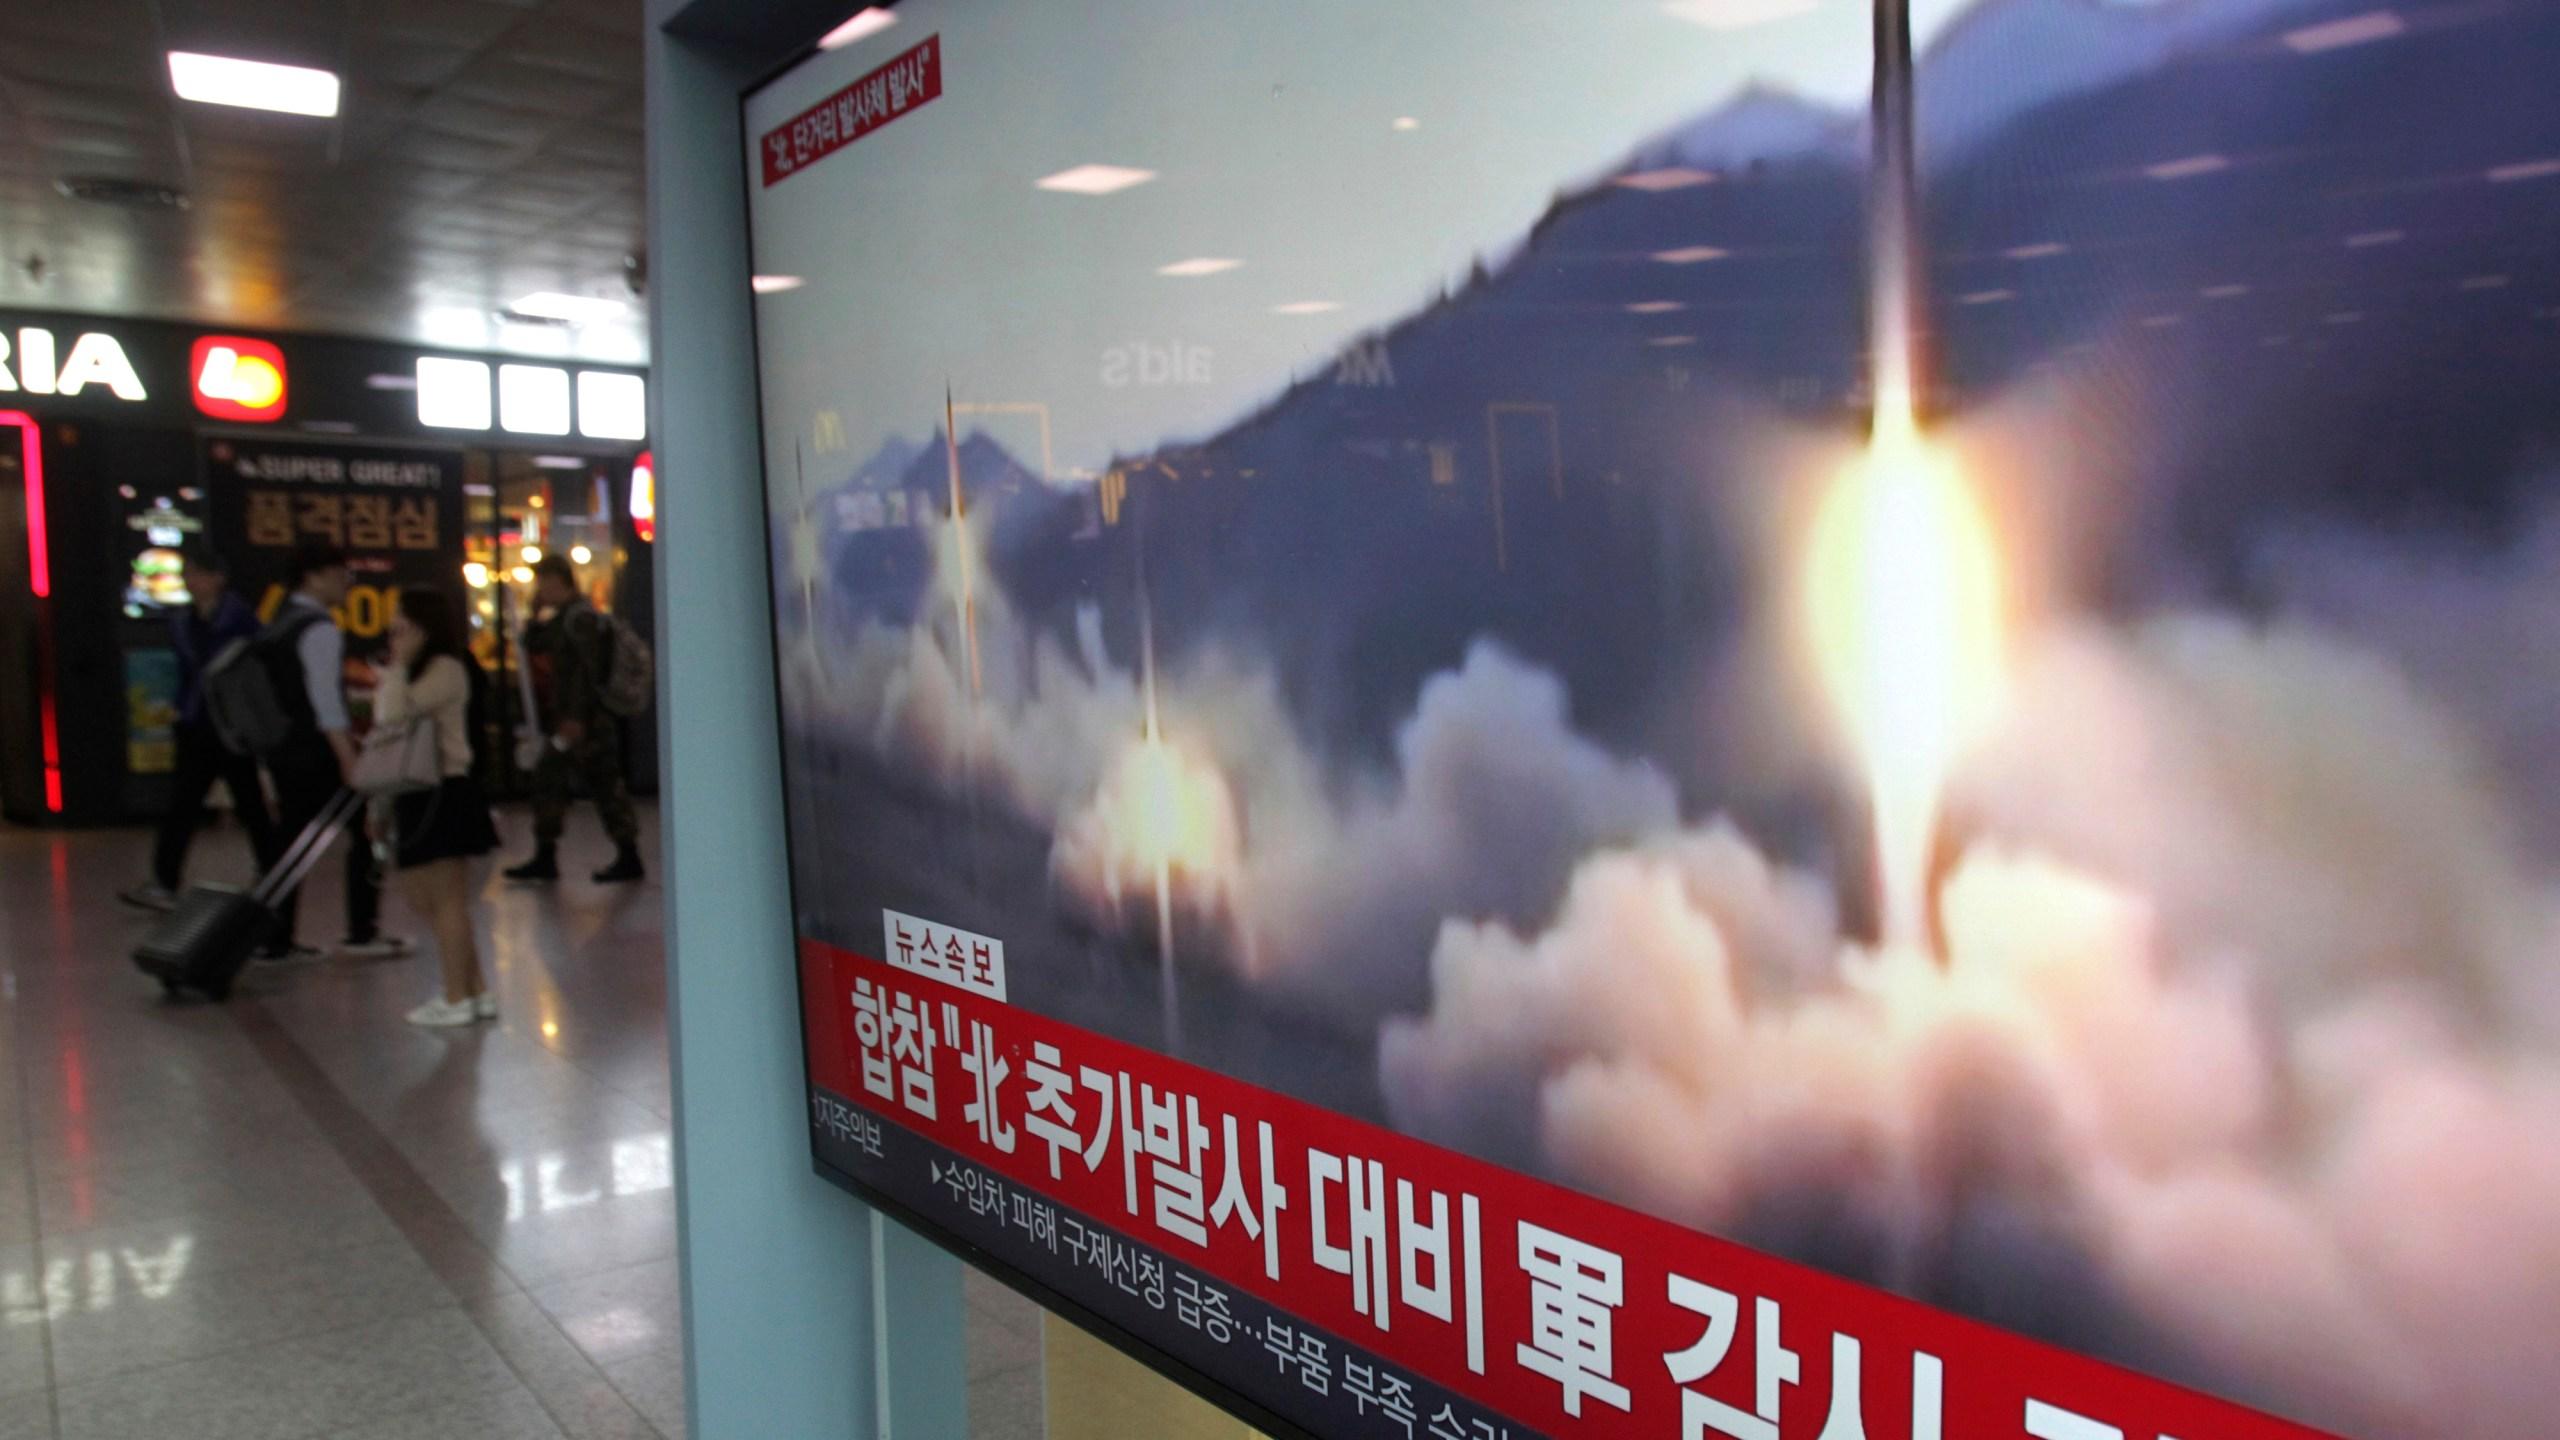 North_Korea_Projectile_02359-159532.jpg94023760